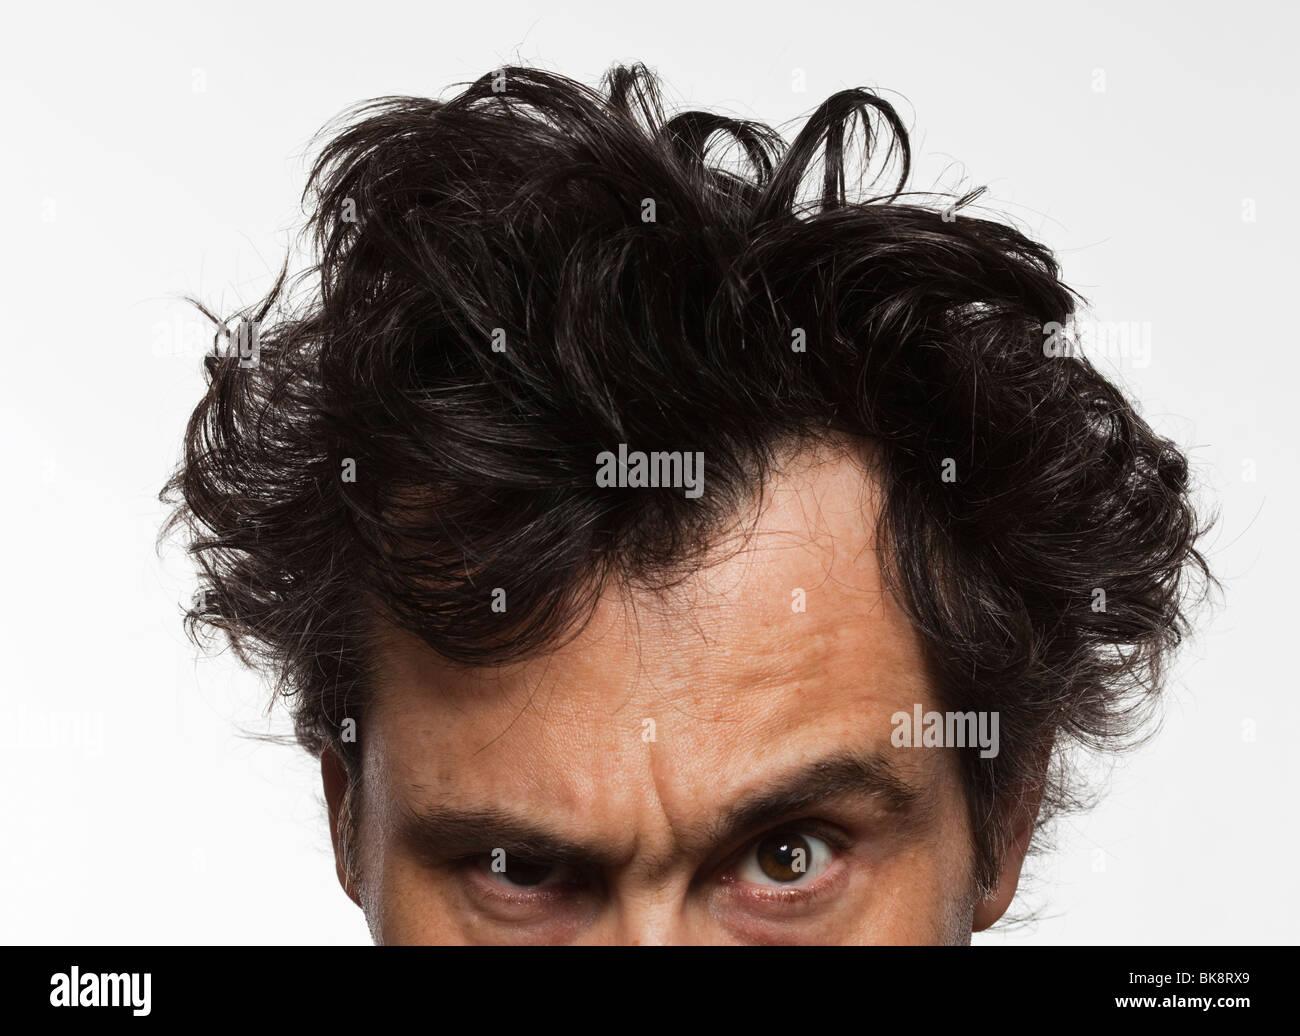 man portrait - Stock Image